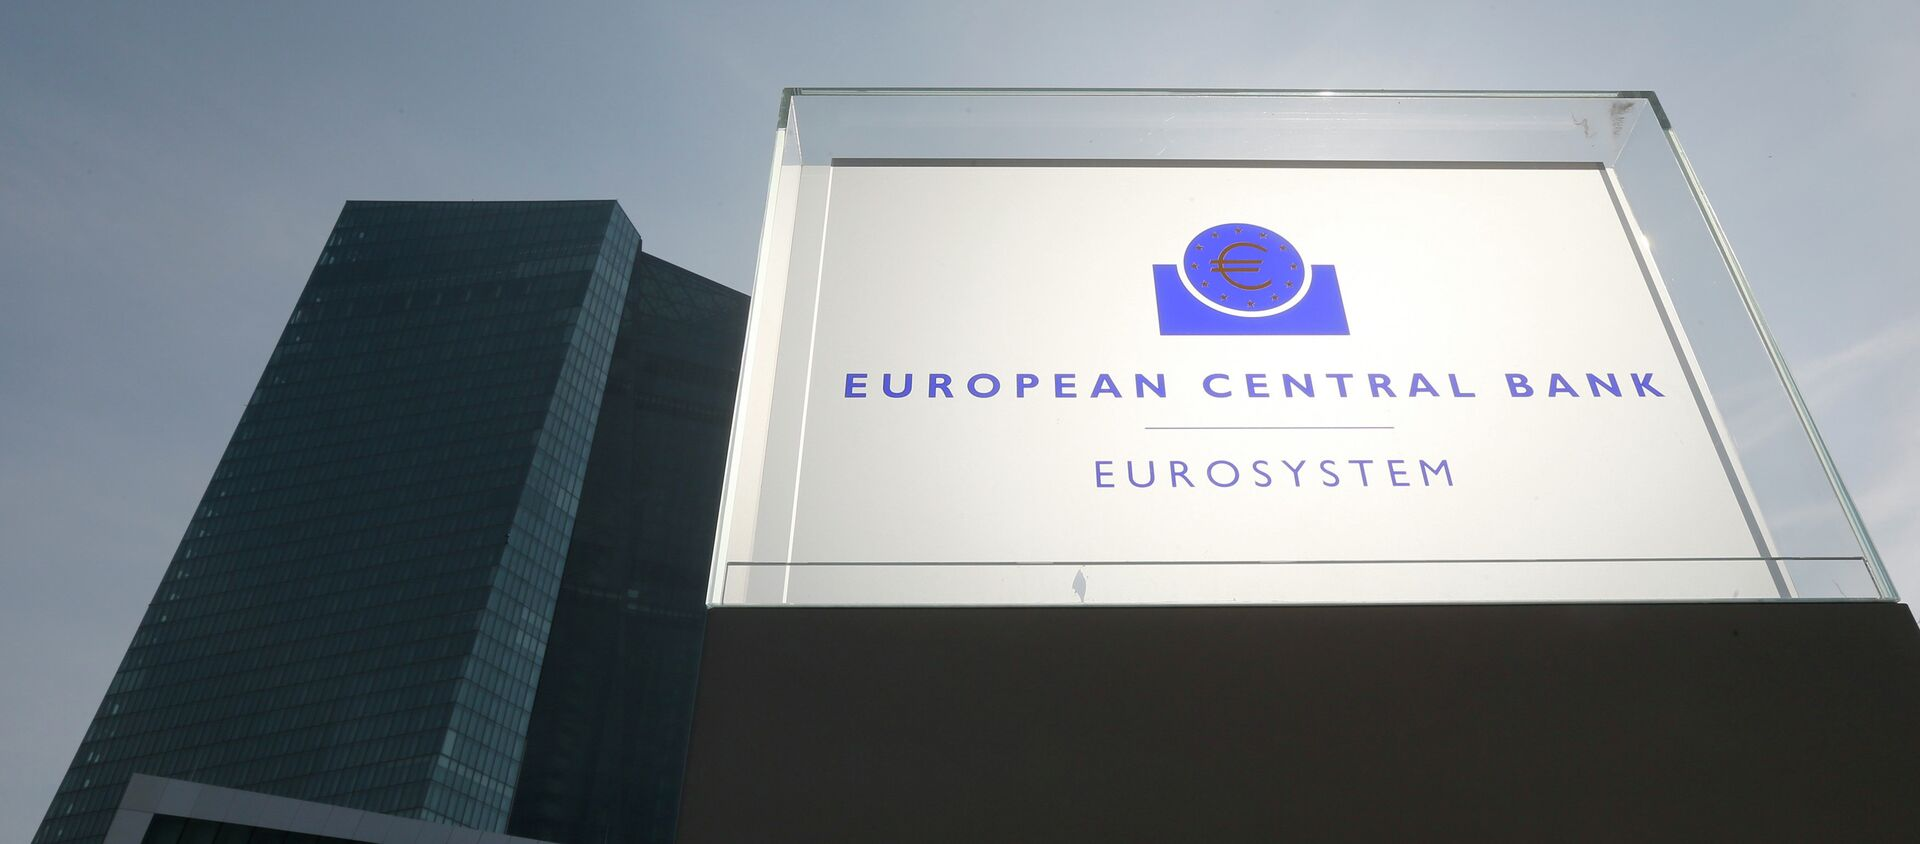 La sede dellas BCE a Francoforte - Sputnik Italia, 1920, 07.01.2021